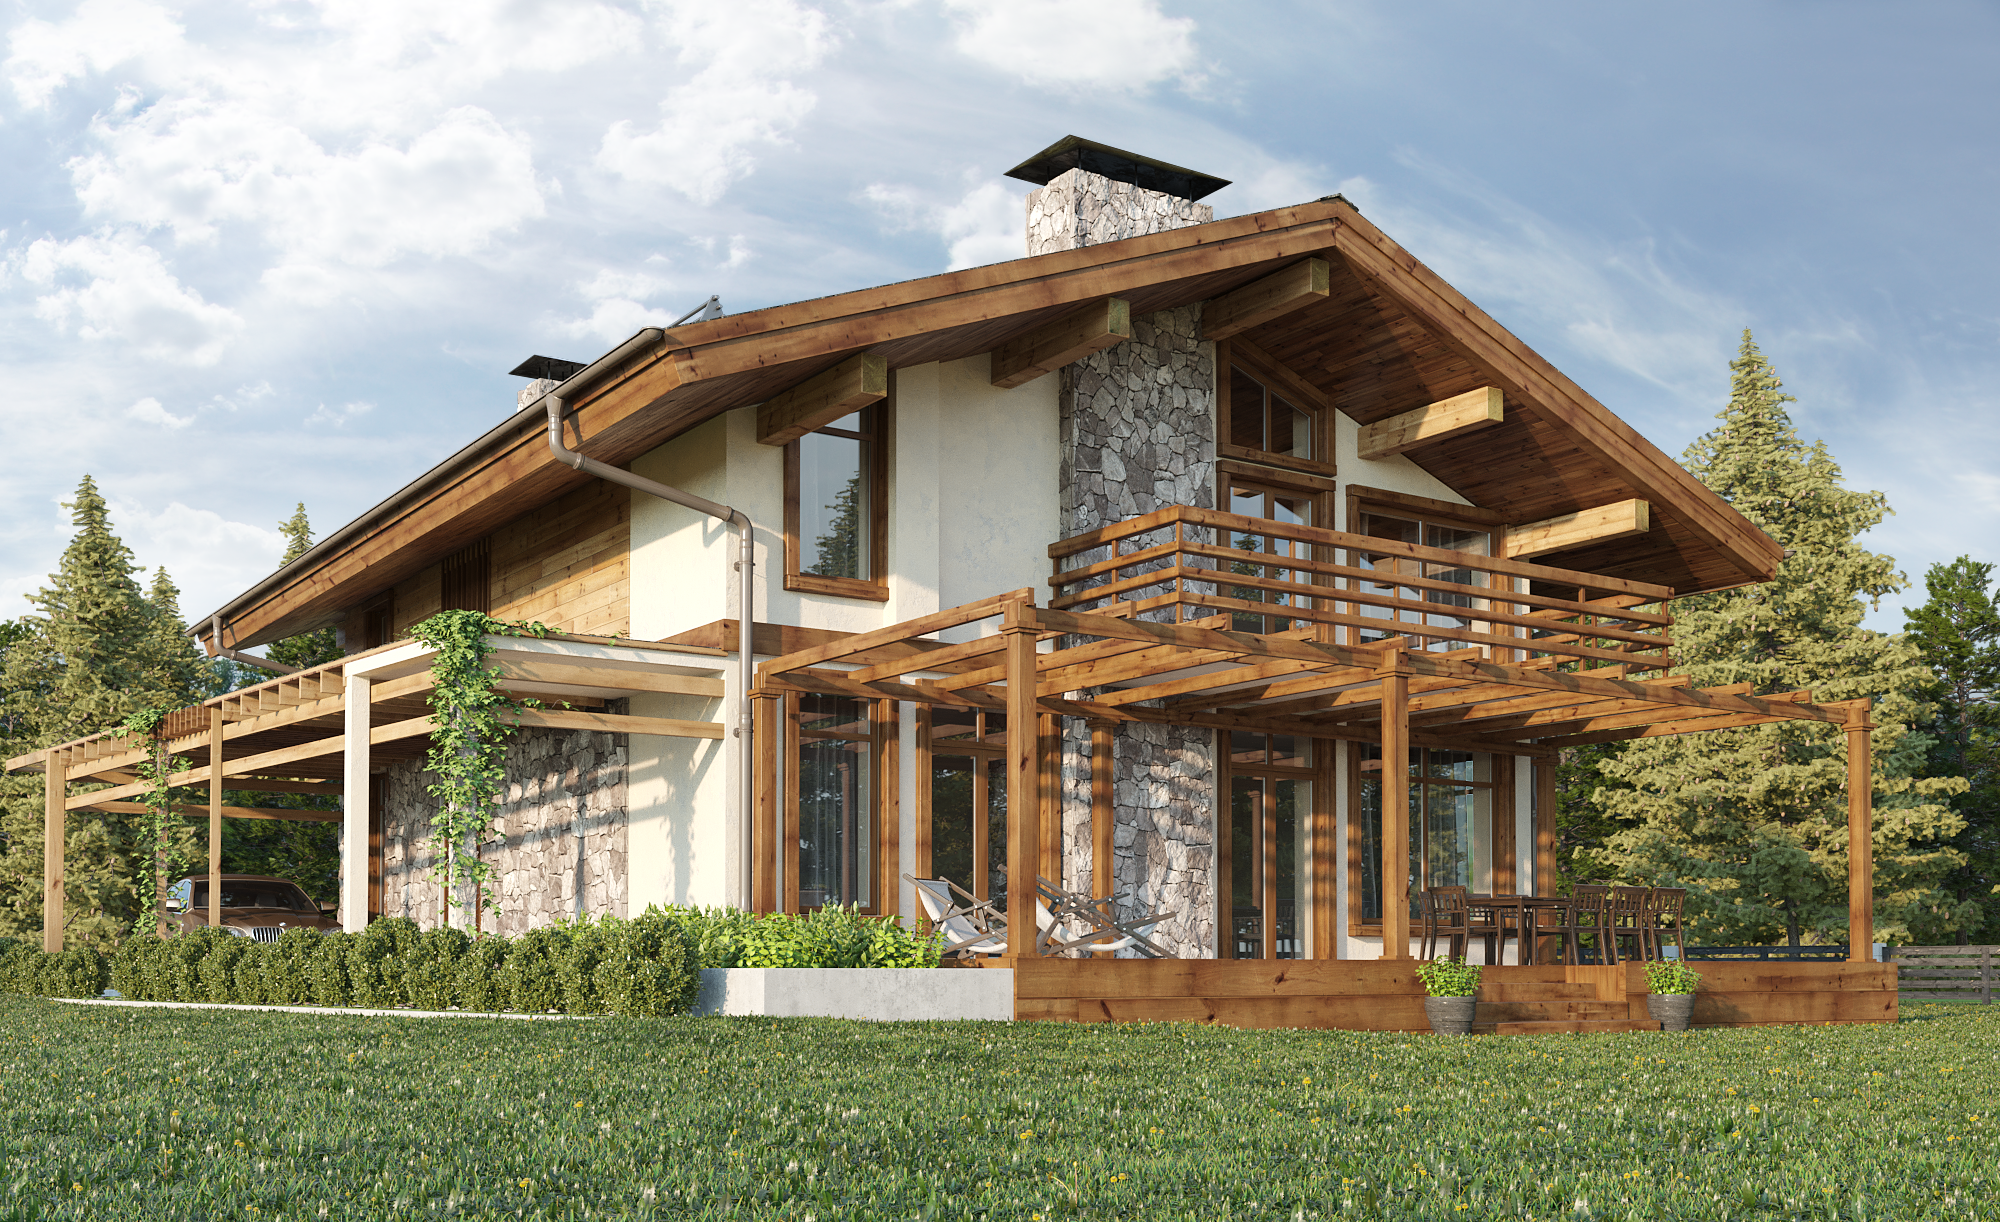 Davinci Haus Musterhaus World of Living Rheinau 520—360